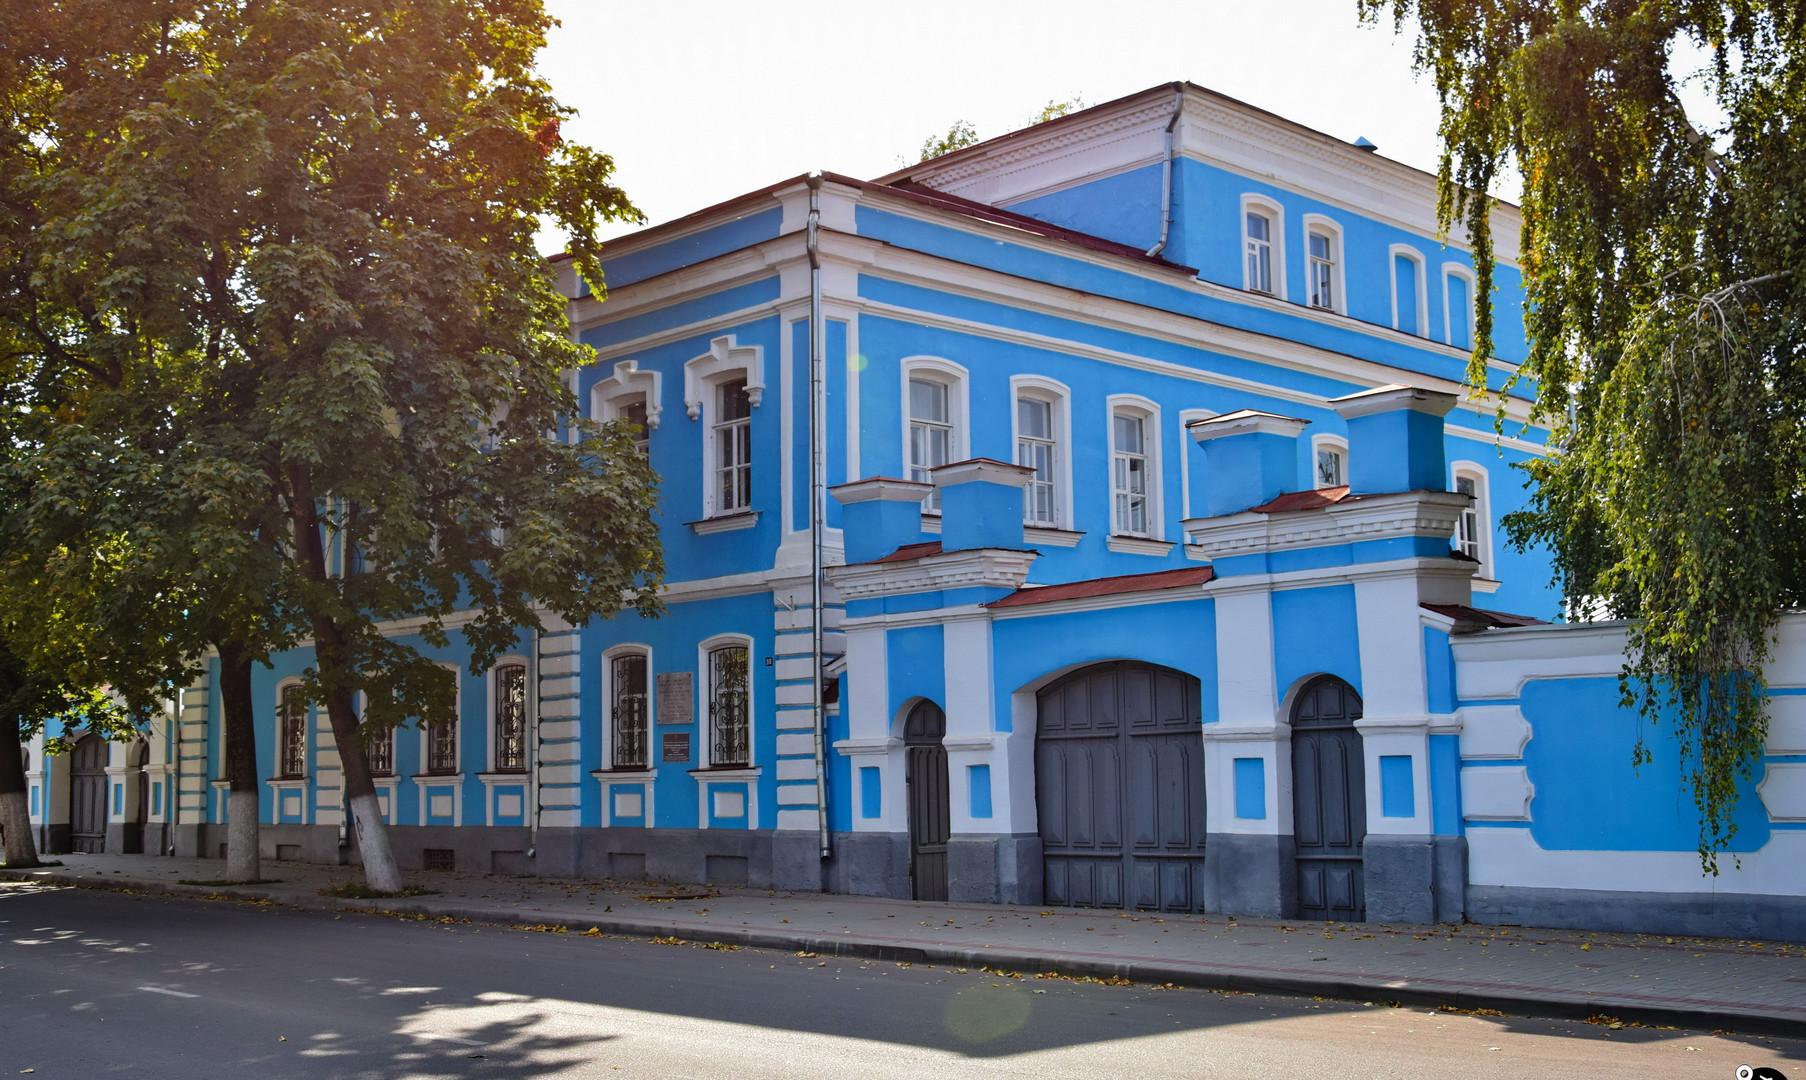 Елецкий краеведческий музей, Елец